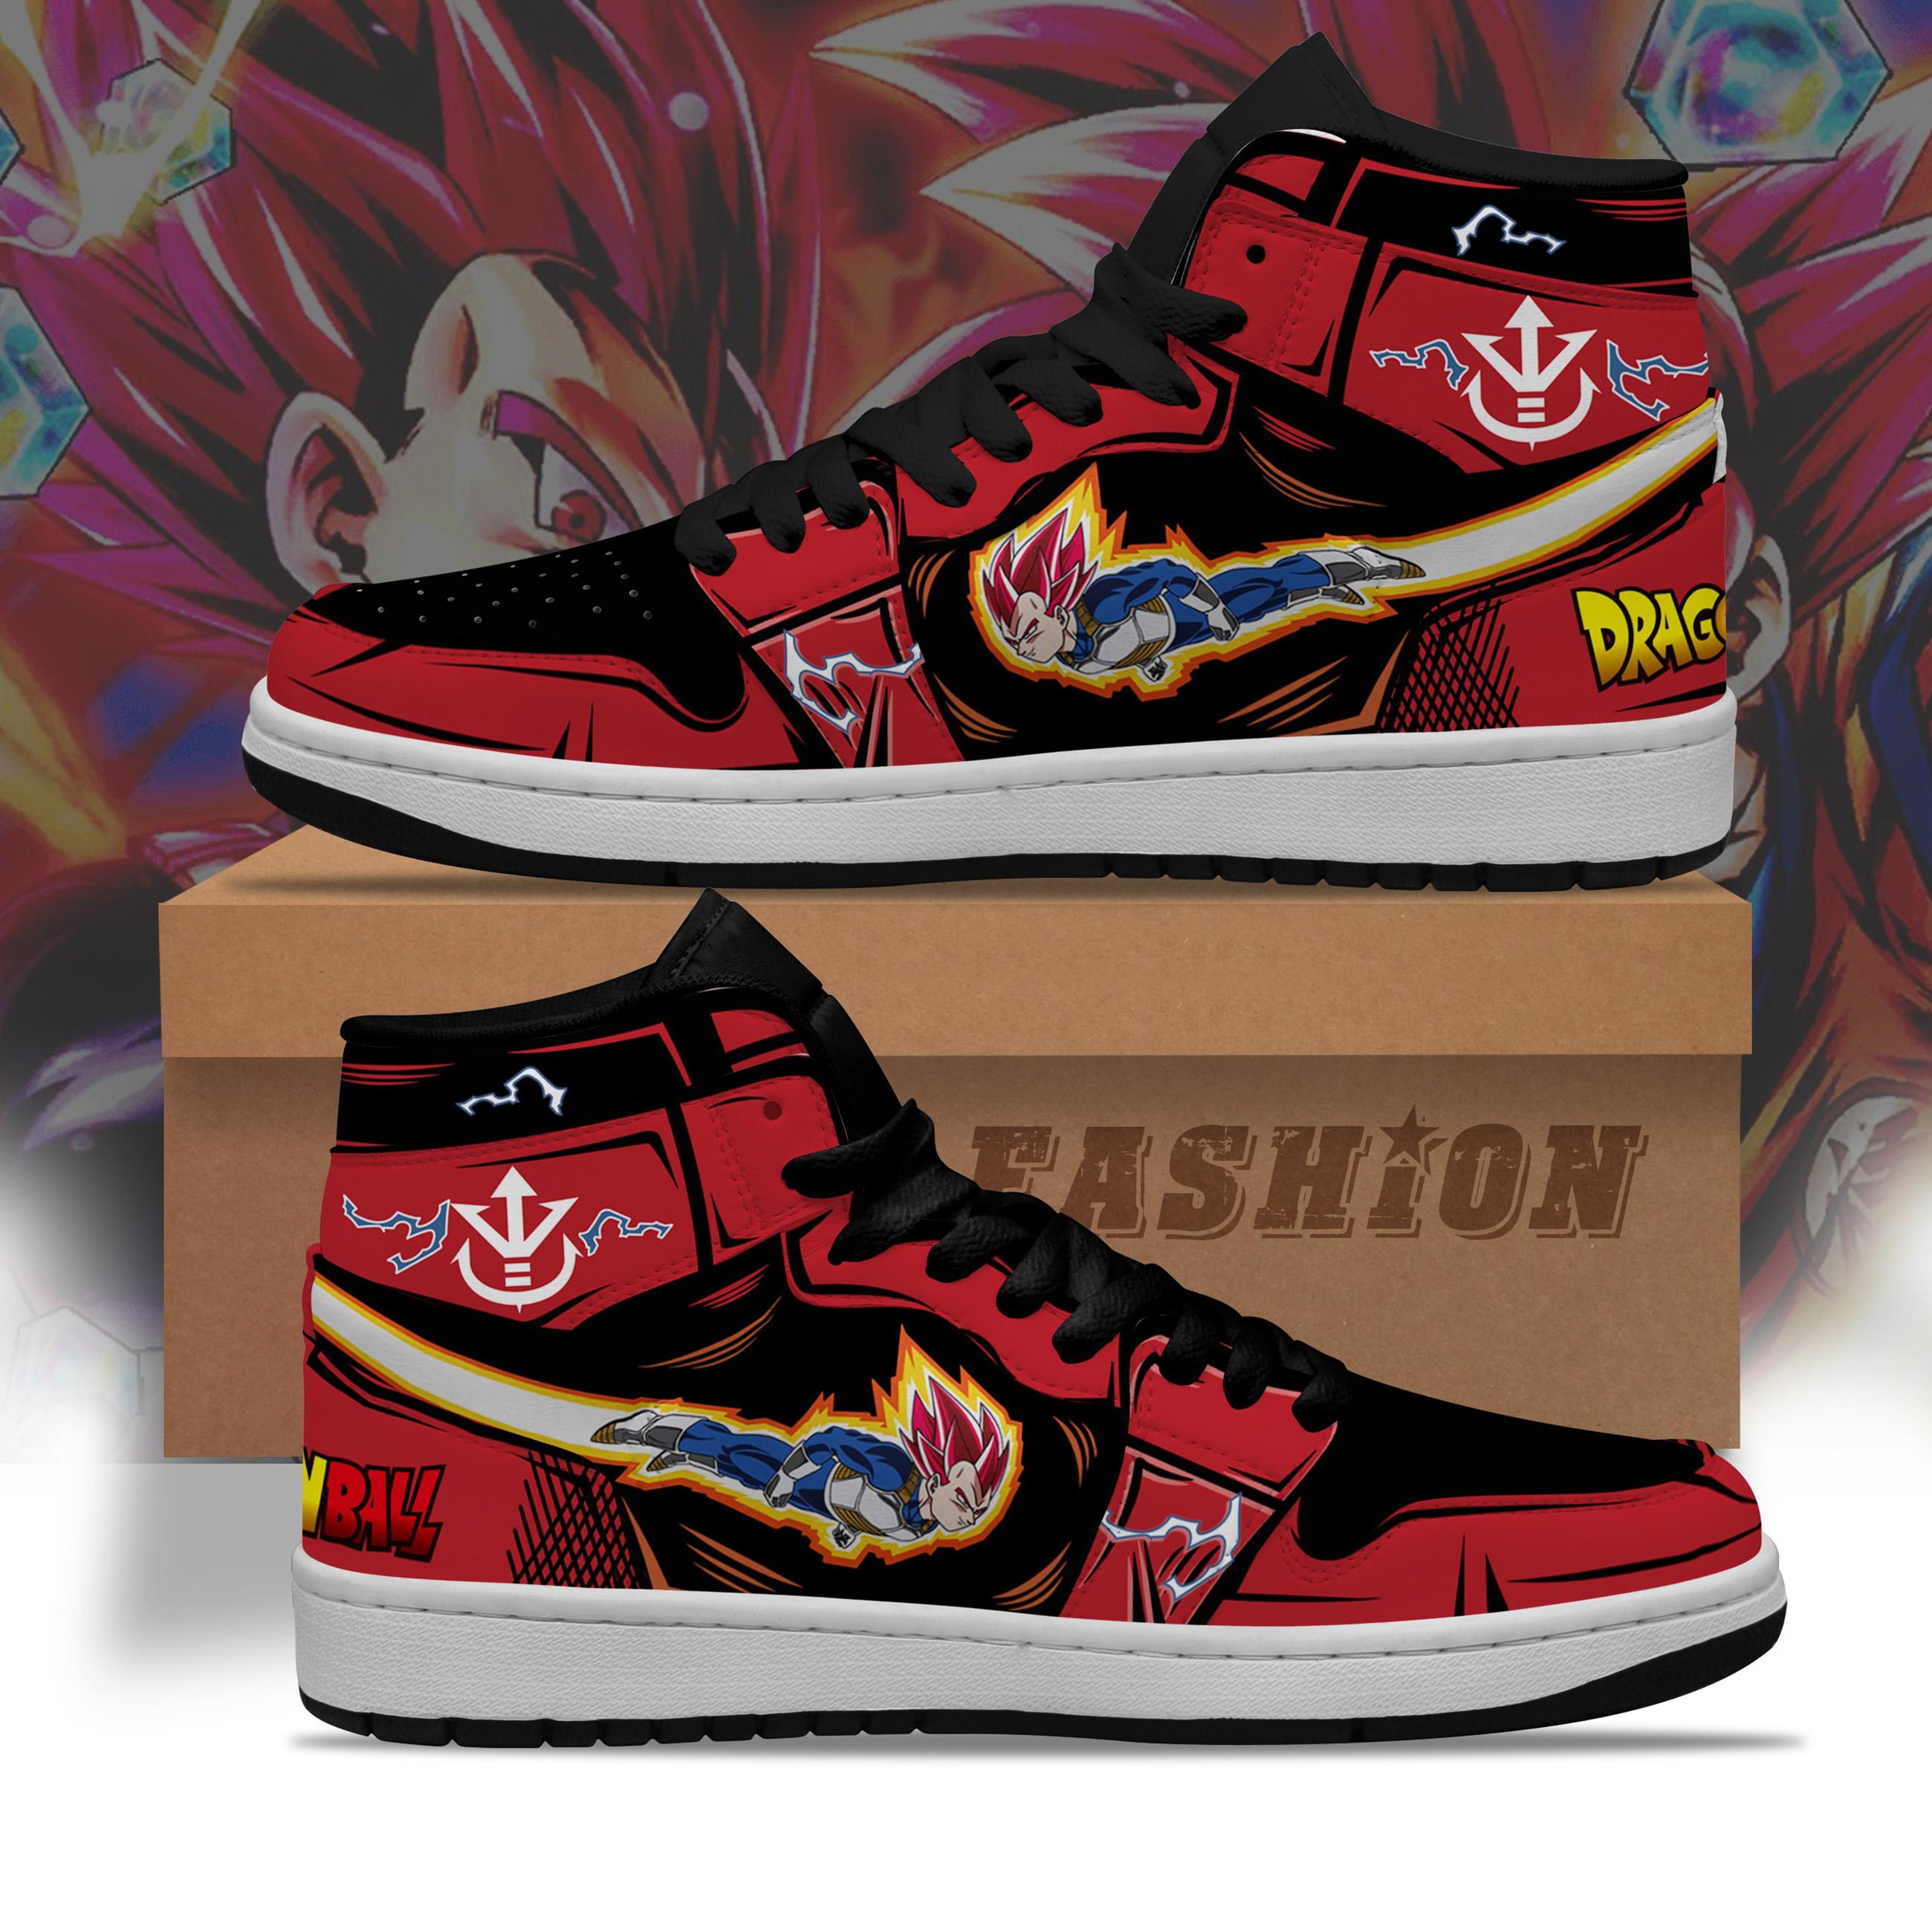 Dragon-Ball-Vegeta-Air-Jordan-JD-Shoes-1